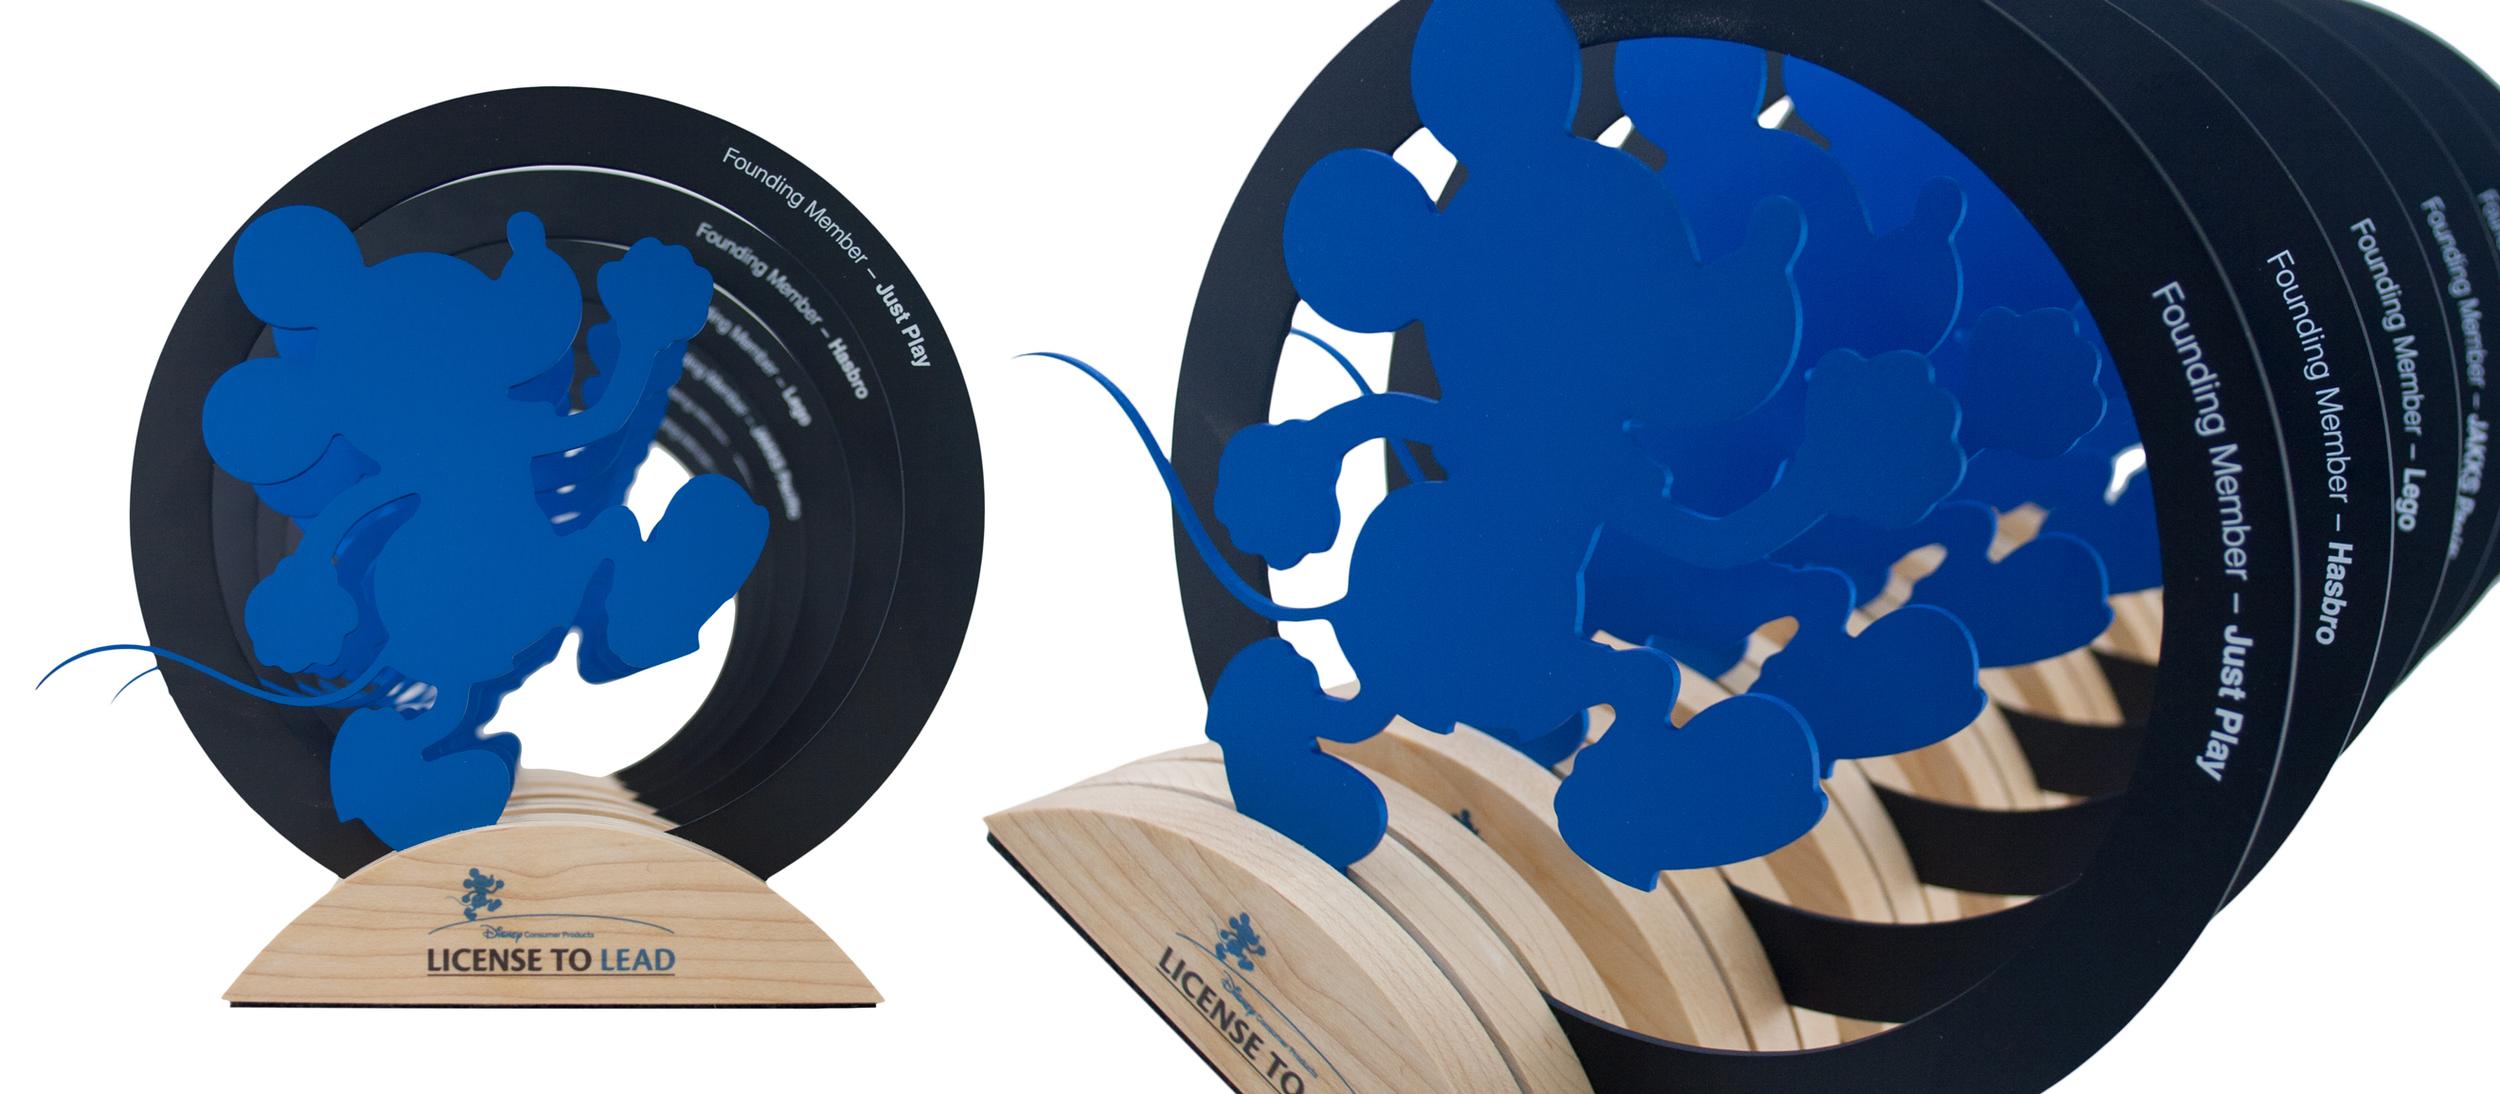 disney-custom-eco-awards-creative-fsc-wood-sustainable.jpg